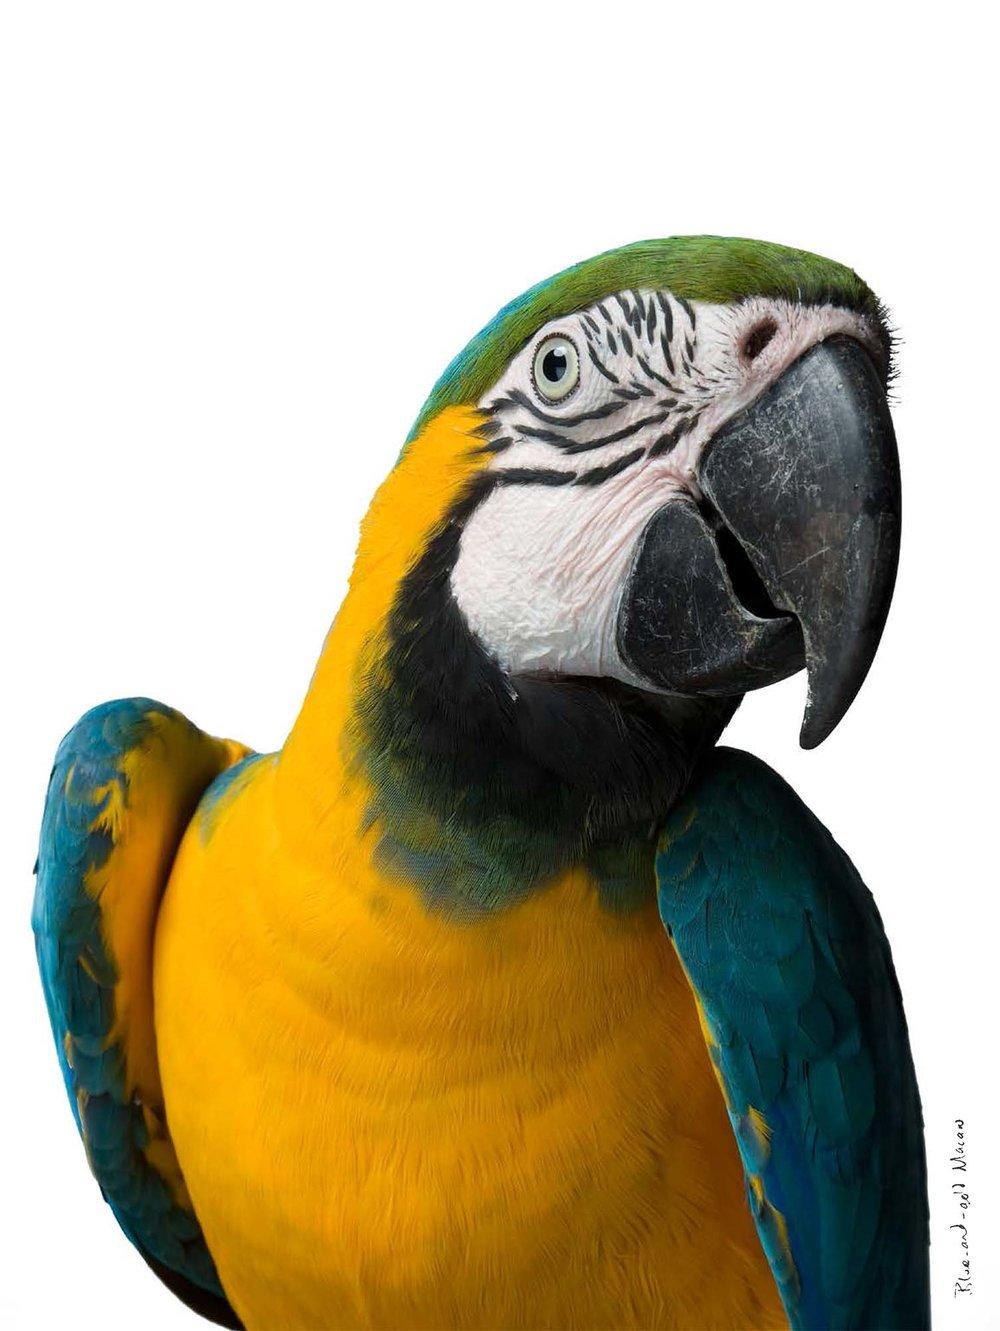 BIRD Gary Heery Book-completemmockup-35.jpg